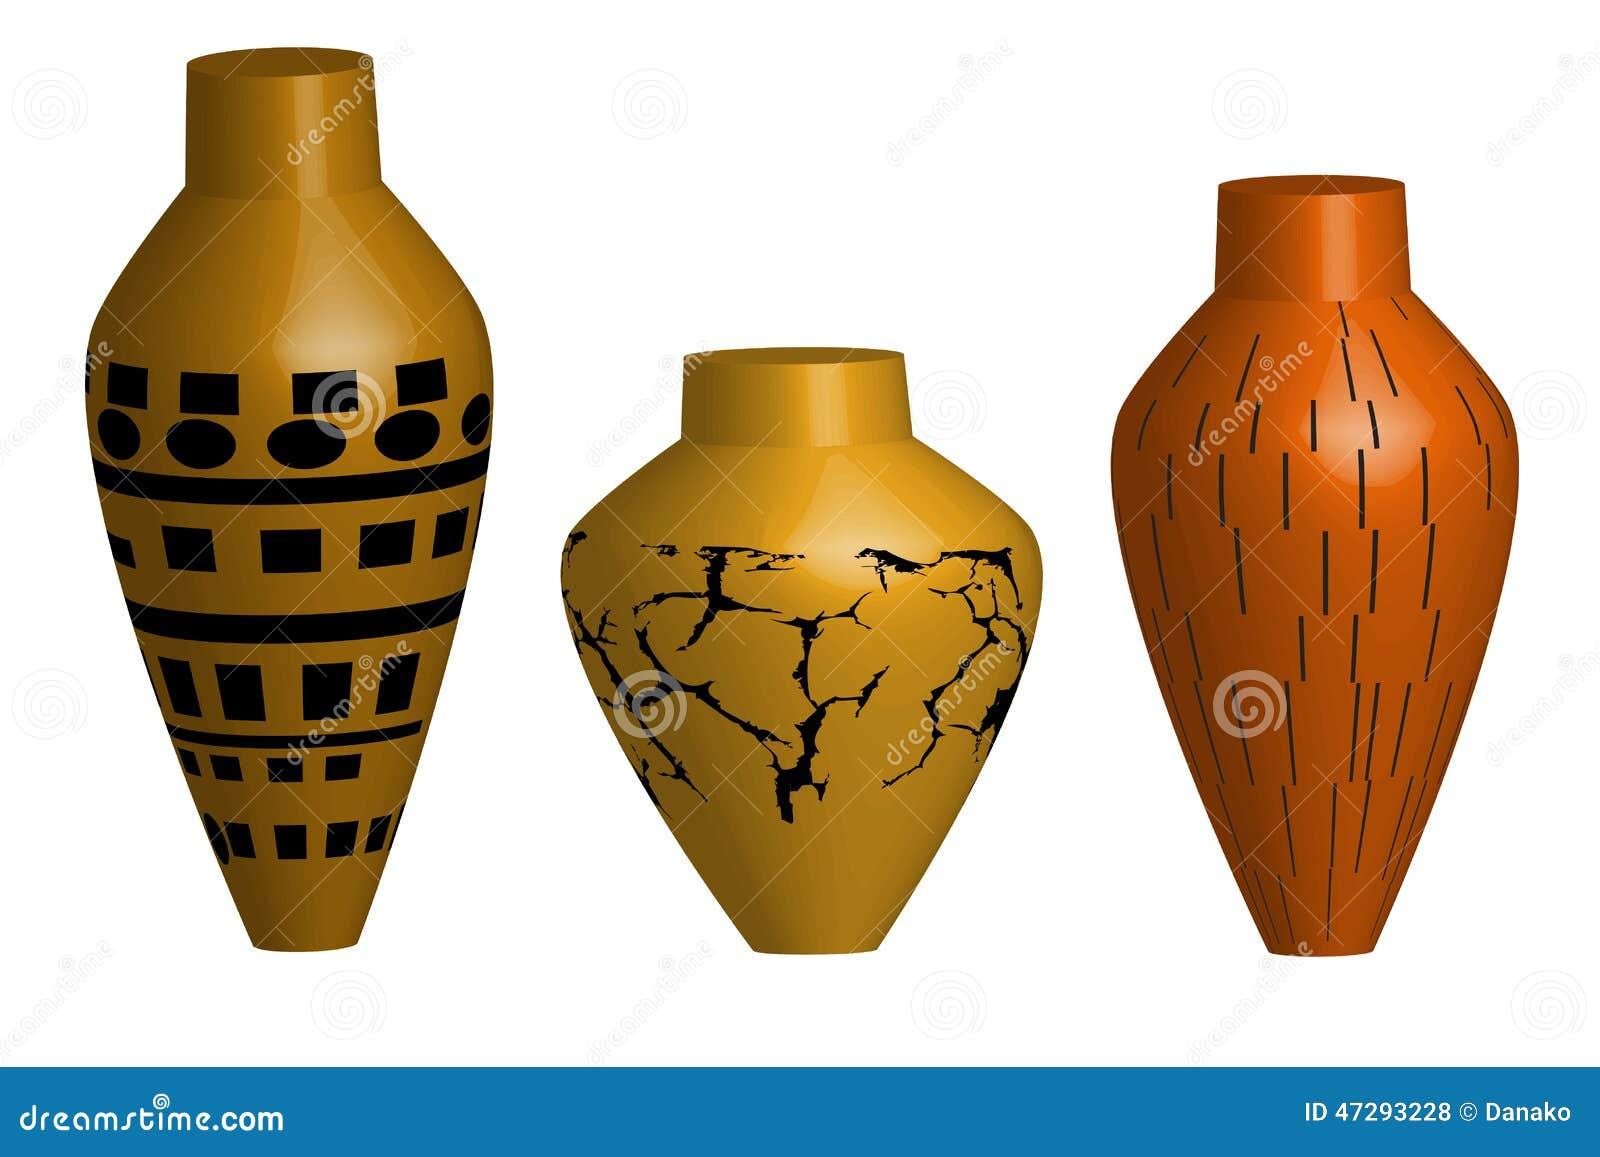 Ceramic vase illustration stock illustration illustration of ceramic vase illustration reviewsmspy